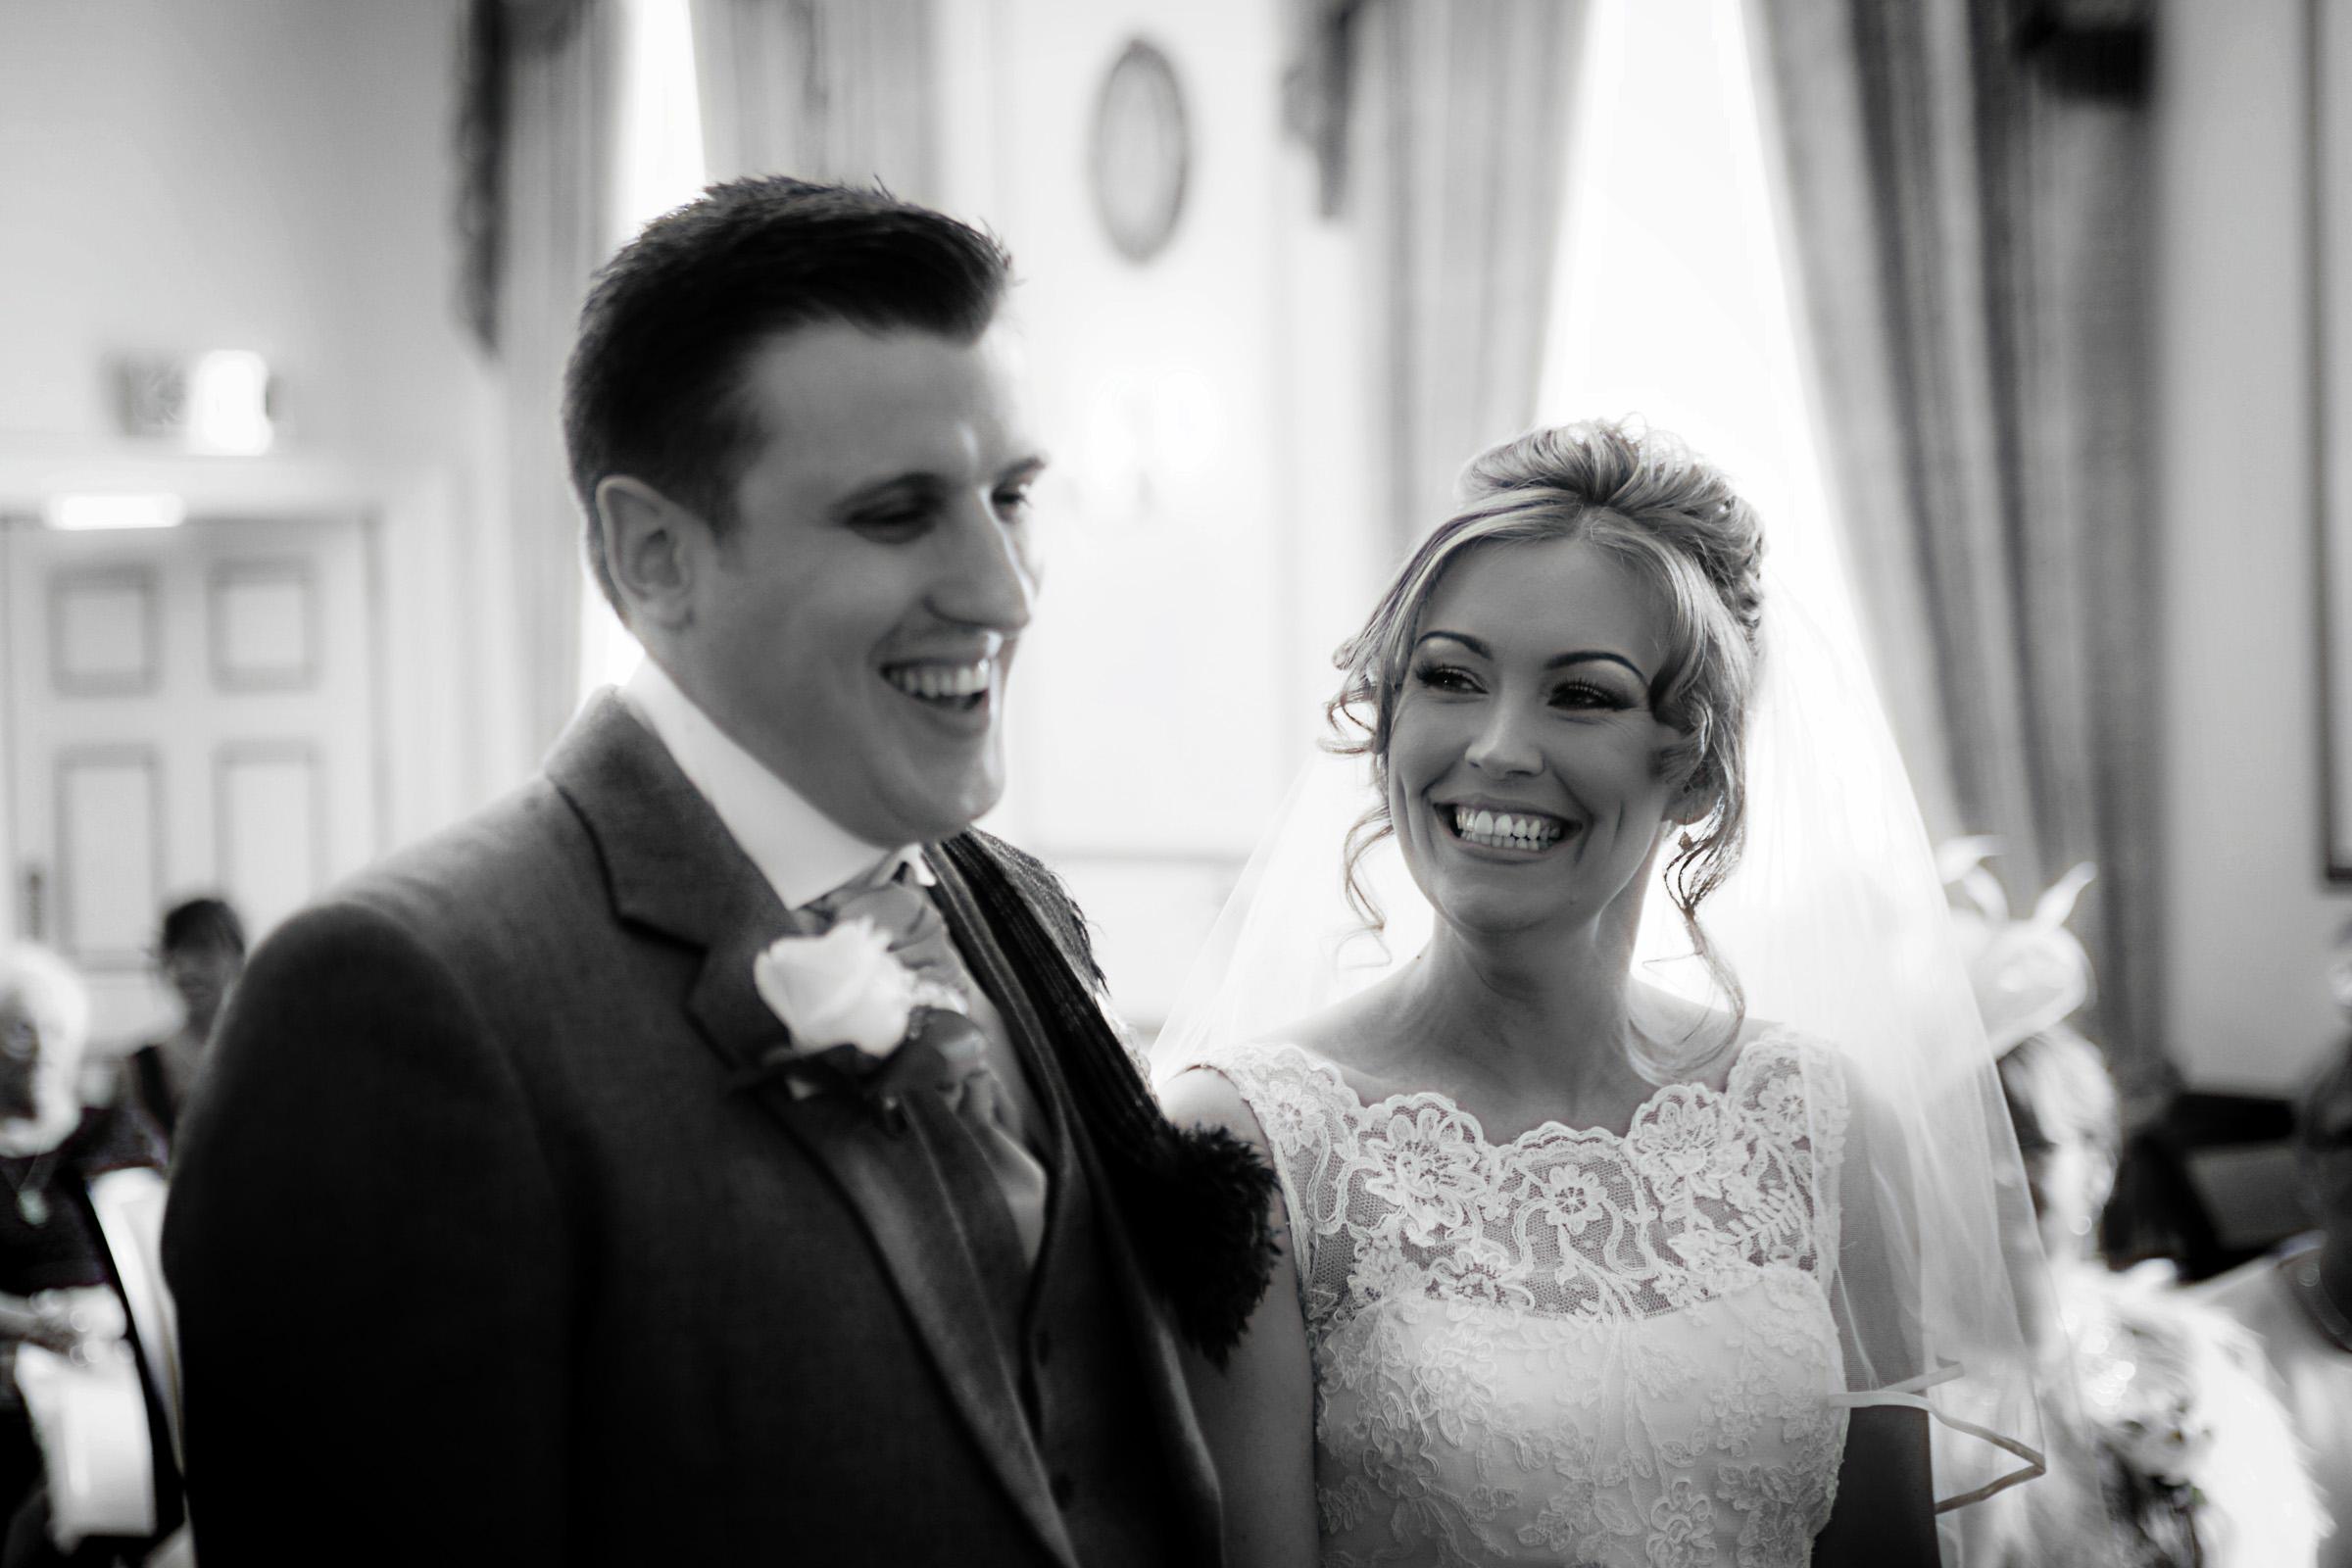 Ceremony_Wedding_Edinburgh_Photographer_banner02.jpg